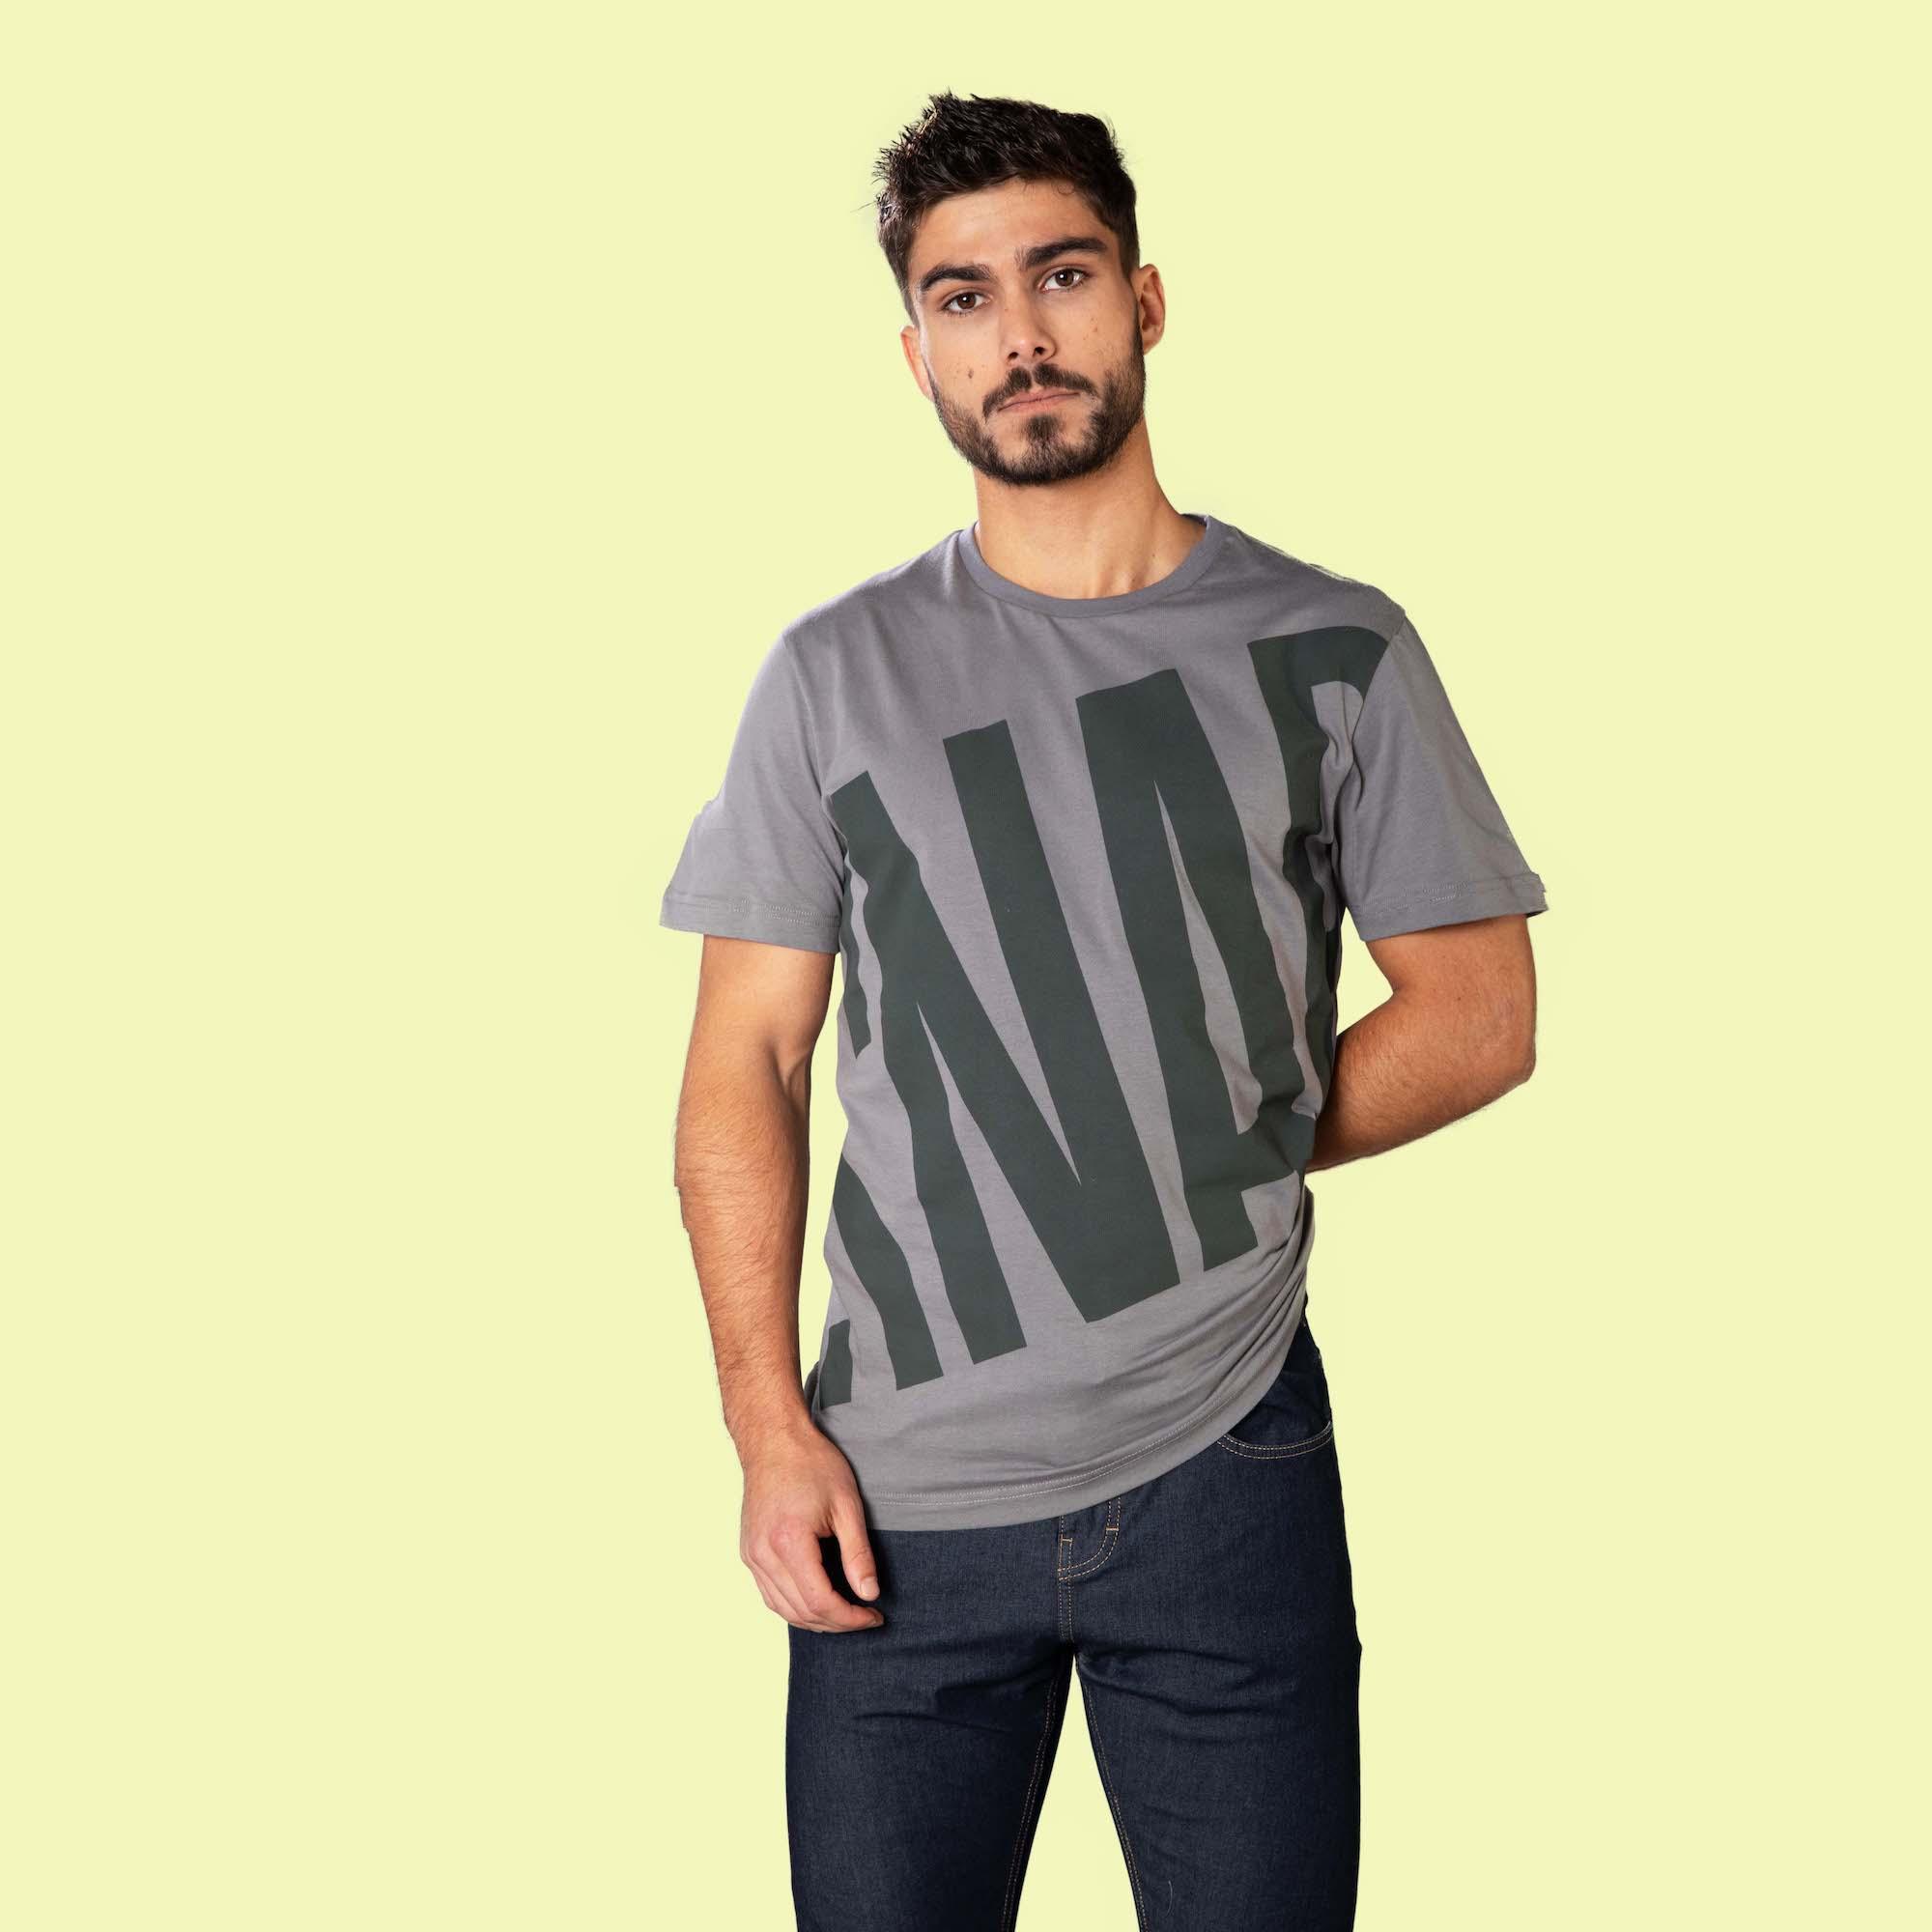 pattern t-shirt for climber